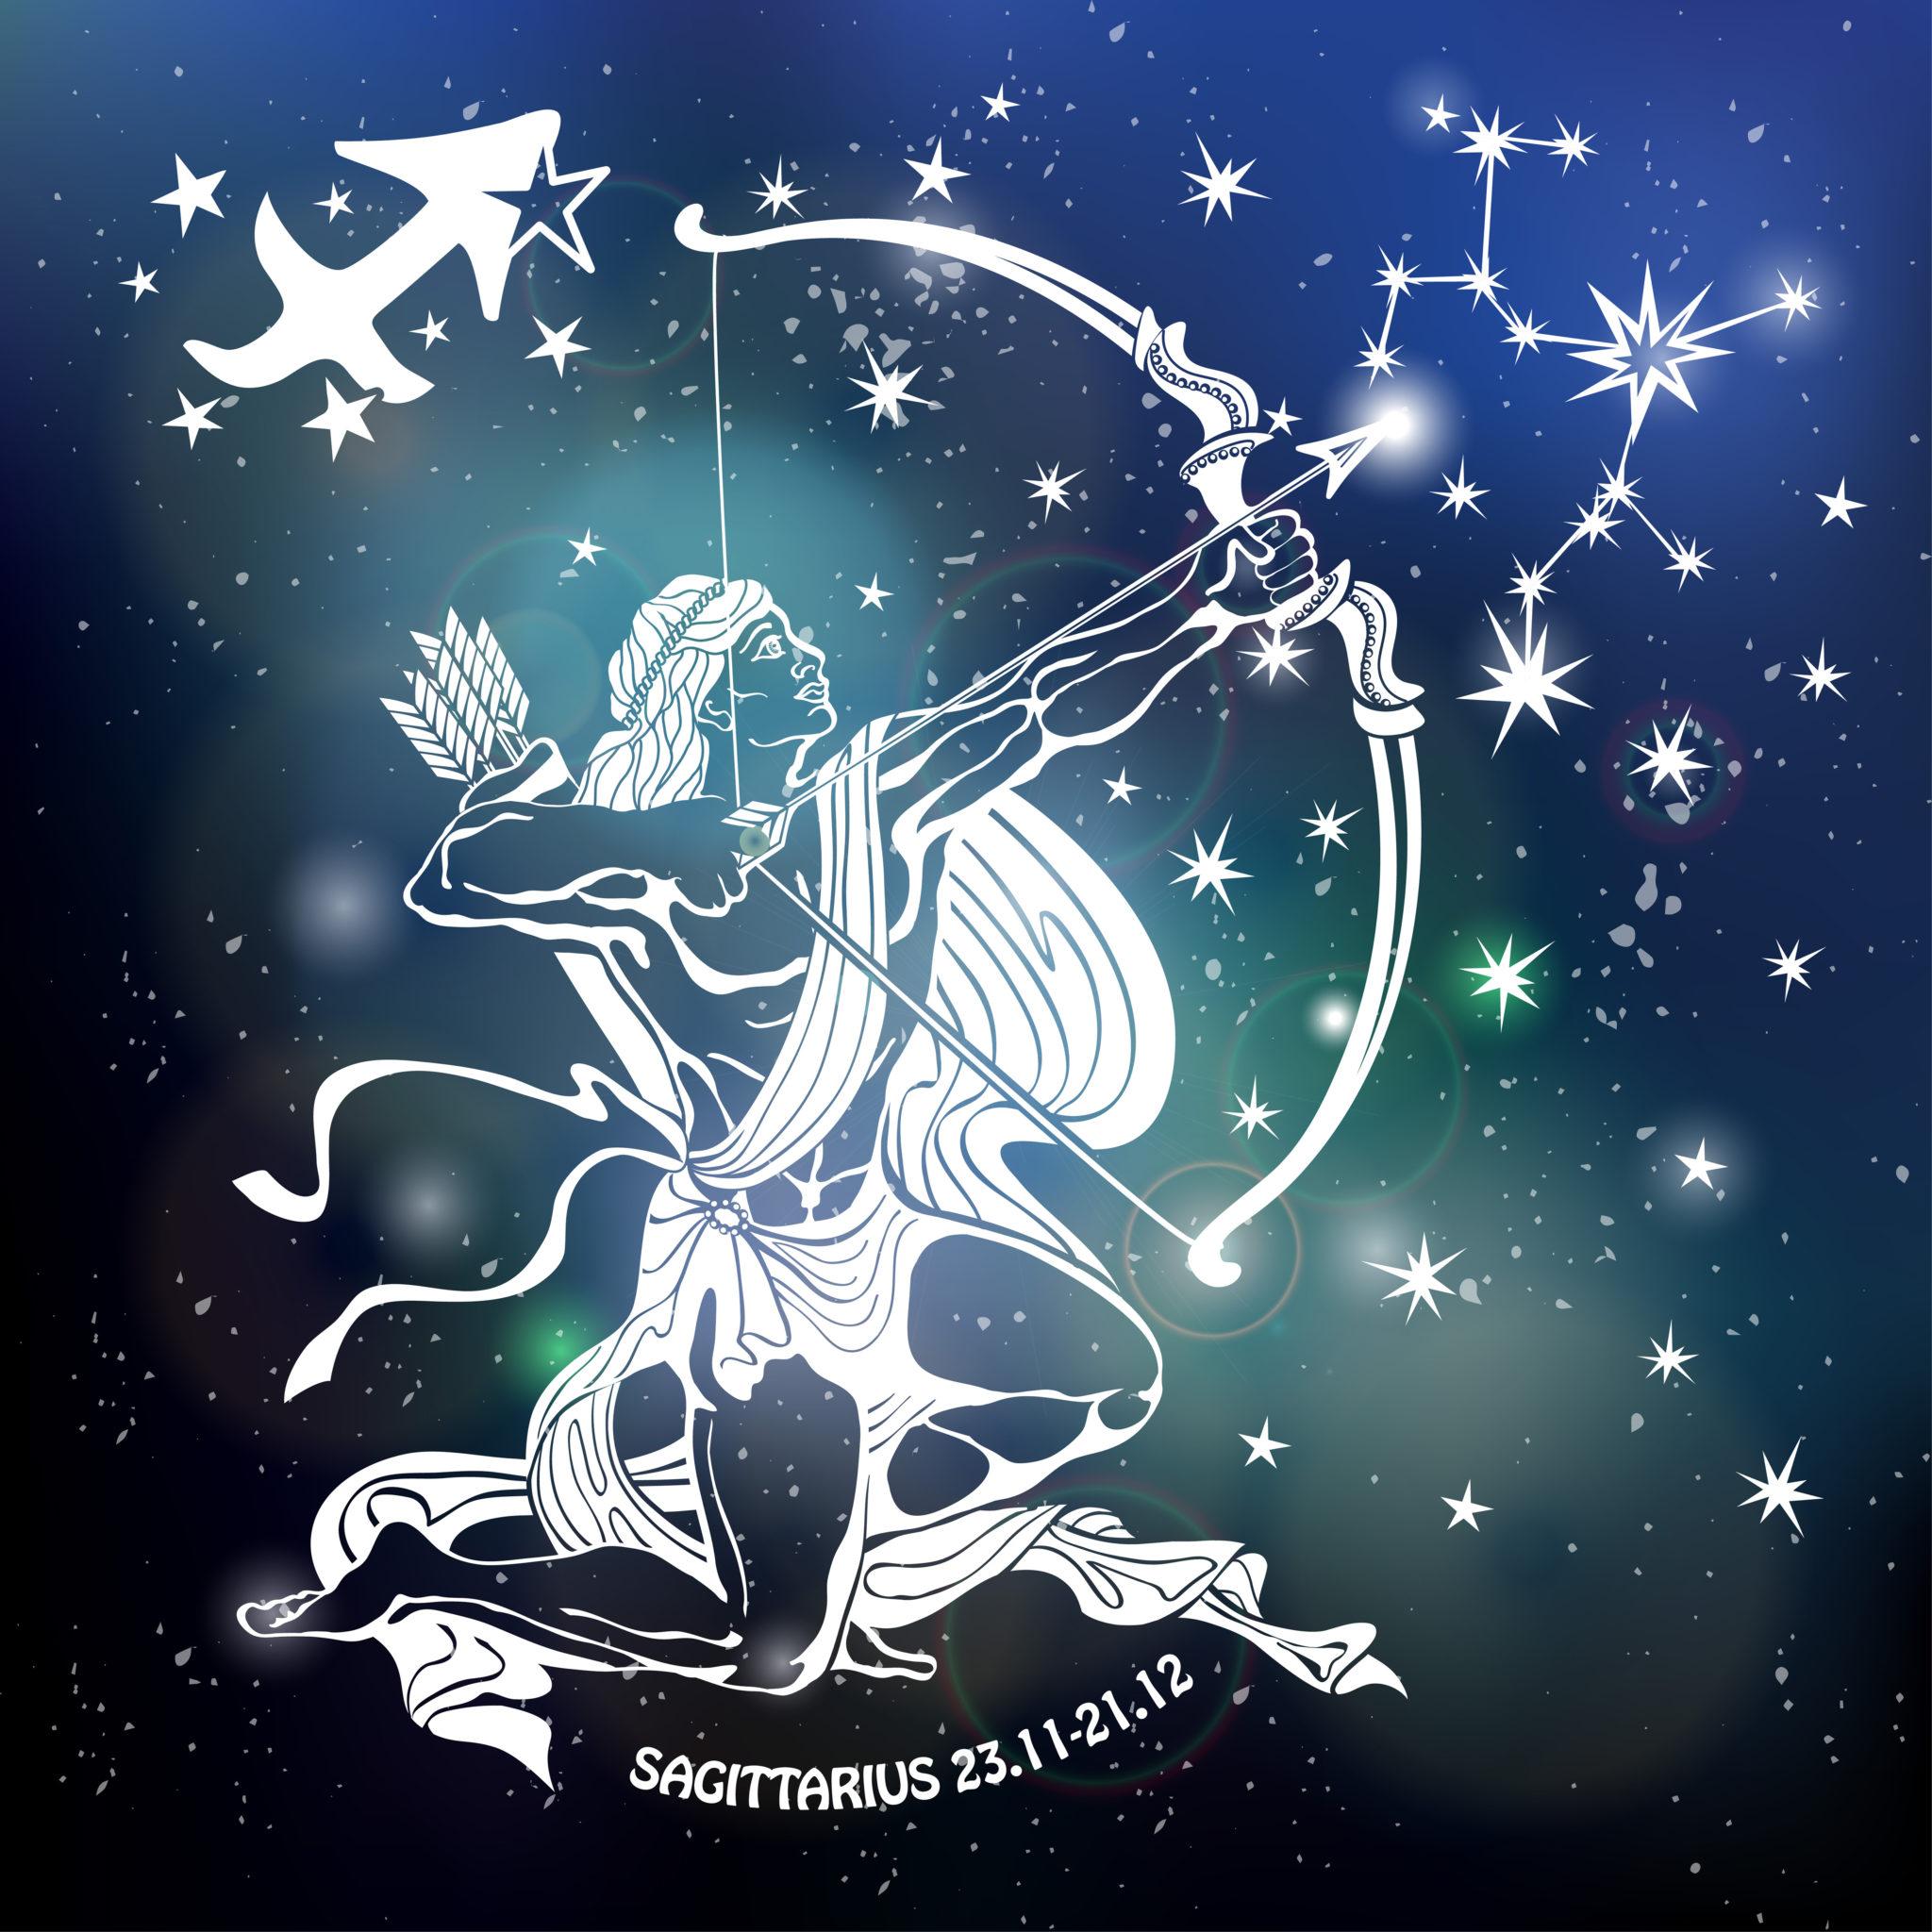 Man a happens sagittarius when you what hurt What Happens